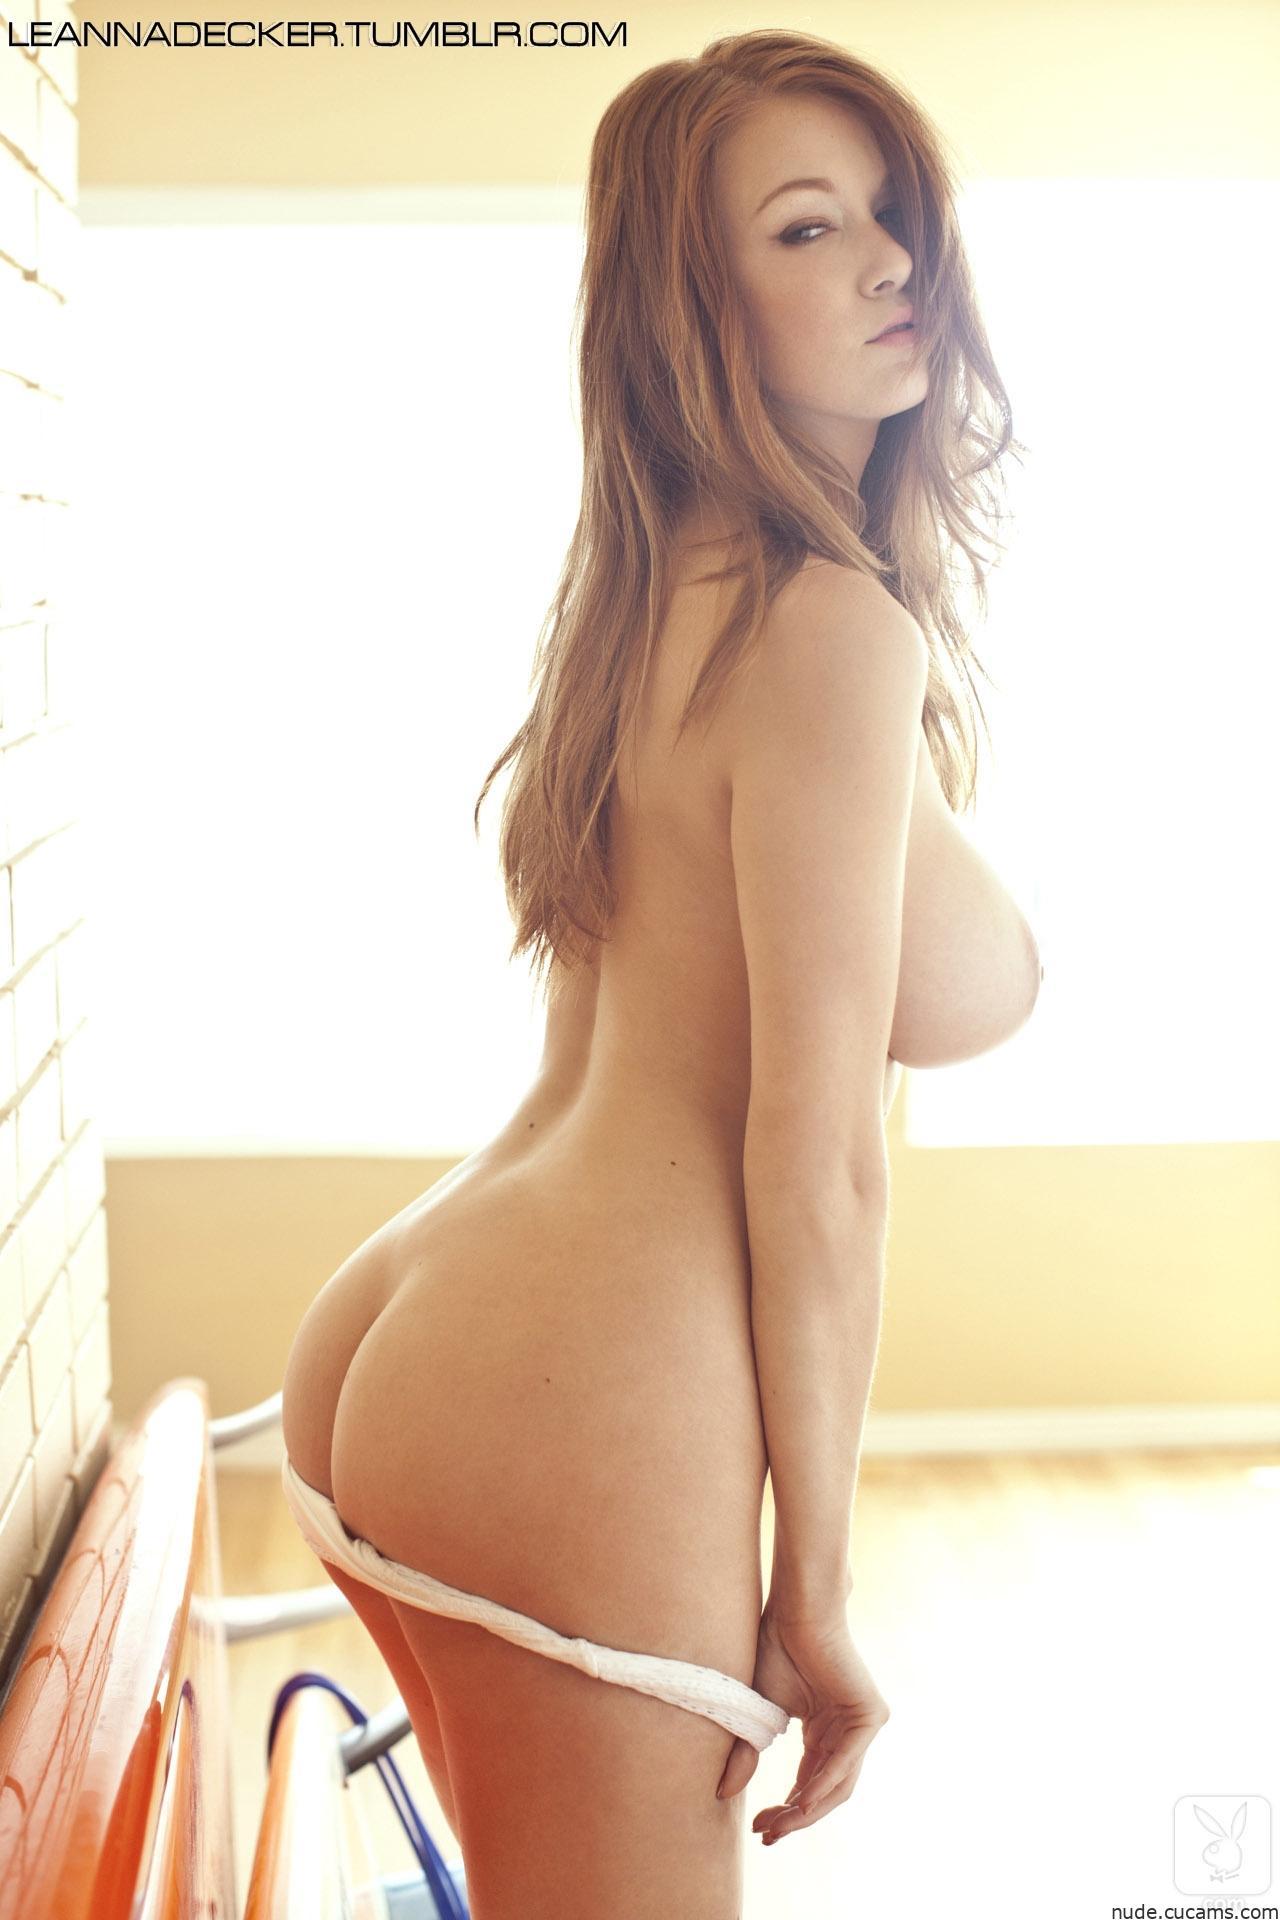 Nude Tits Ebony by nude.cucams.com